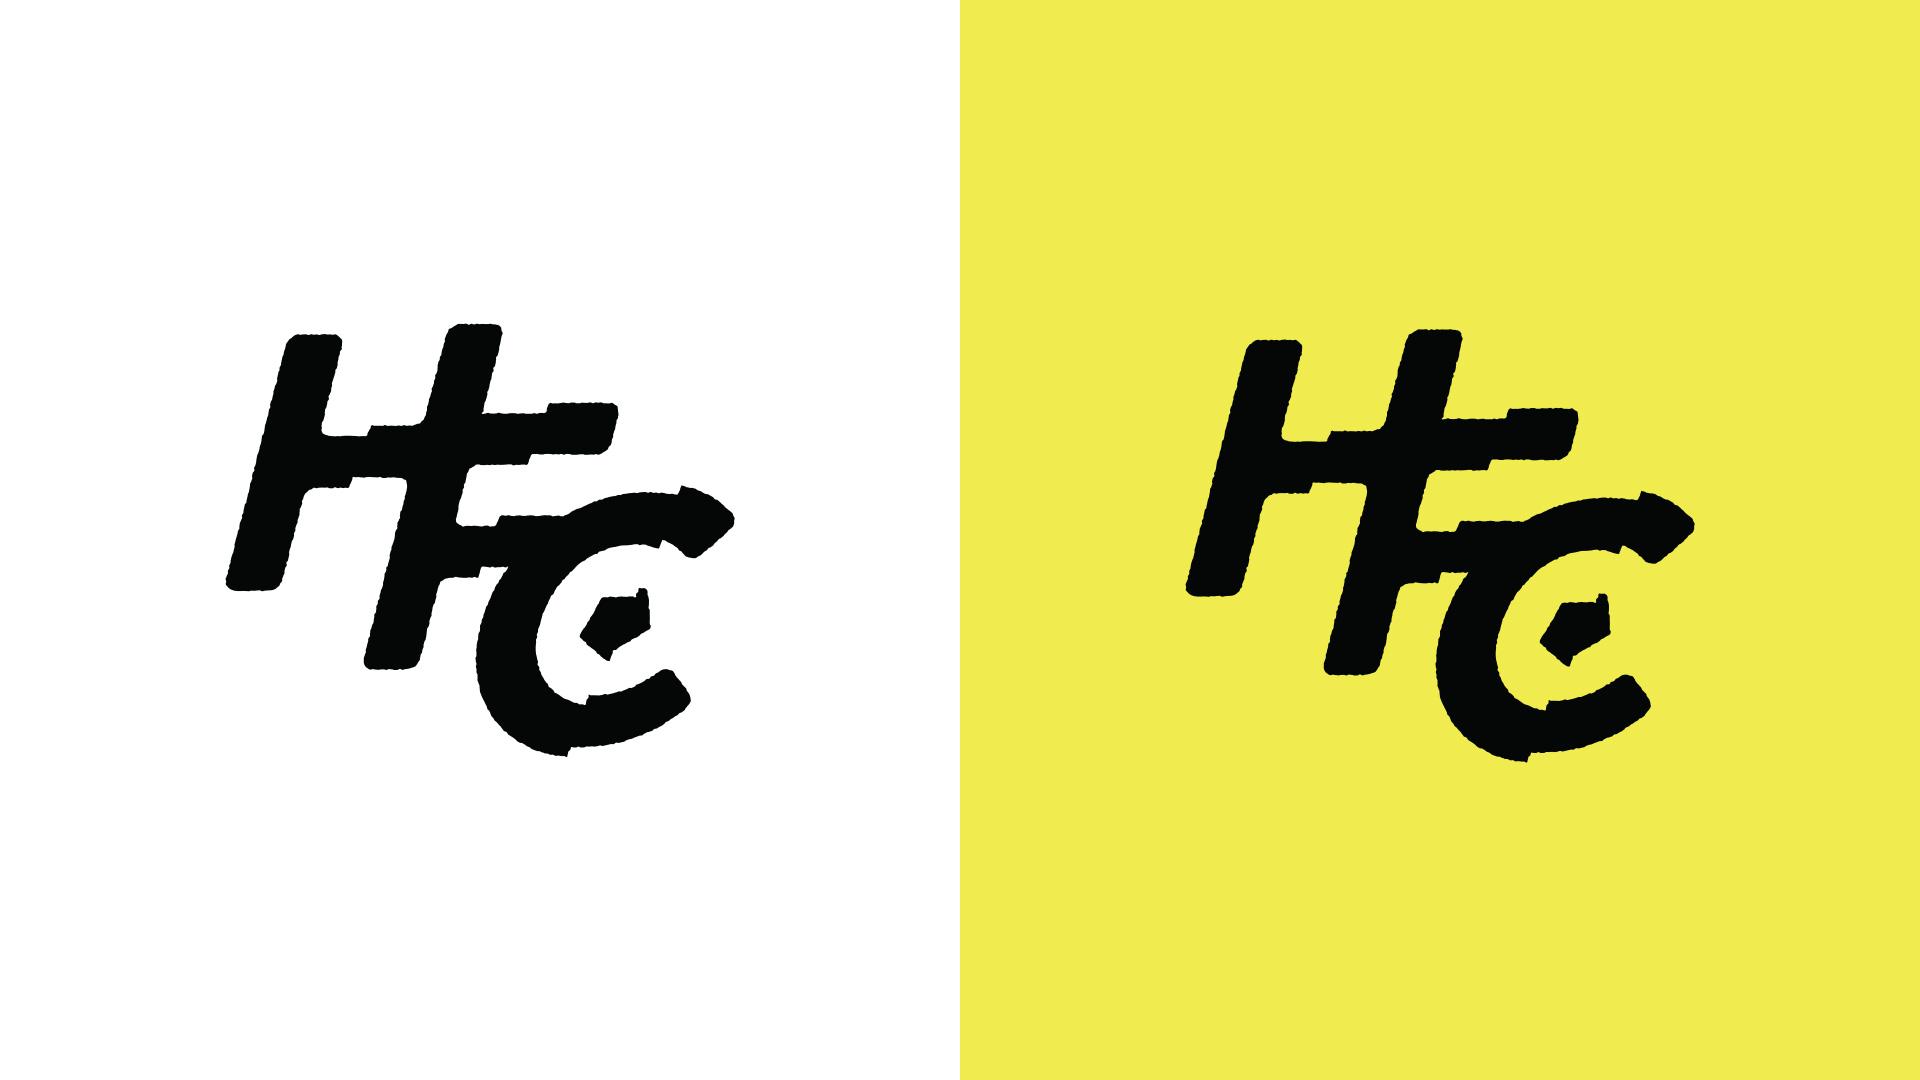 HFC_3.jpg